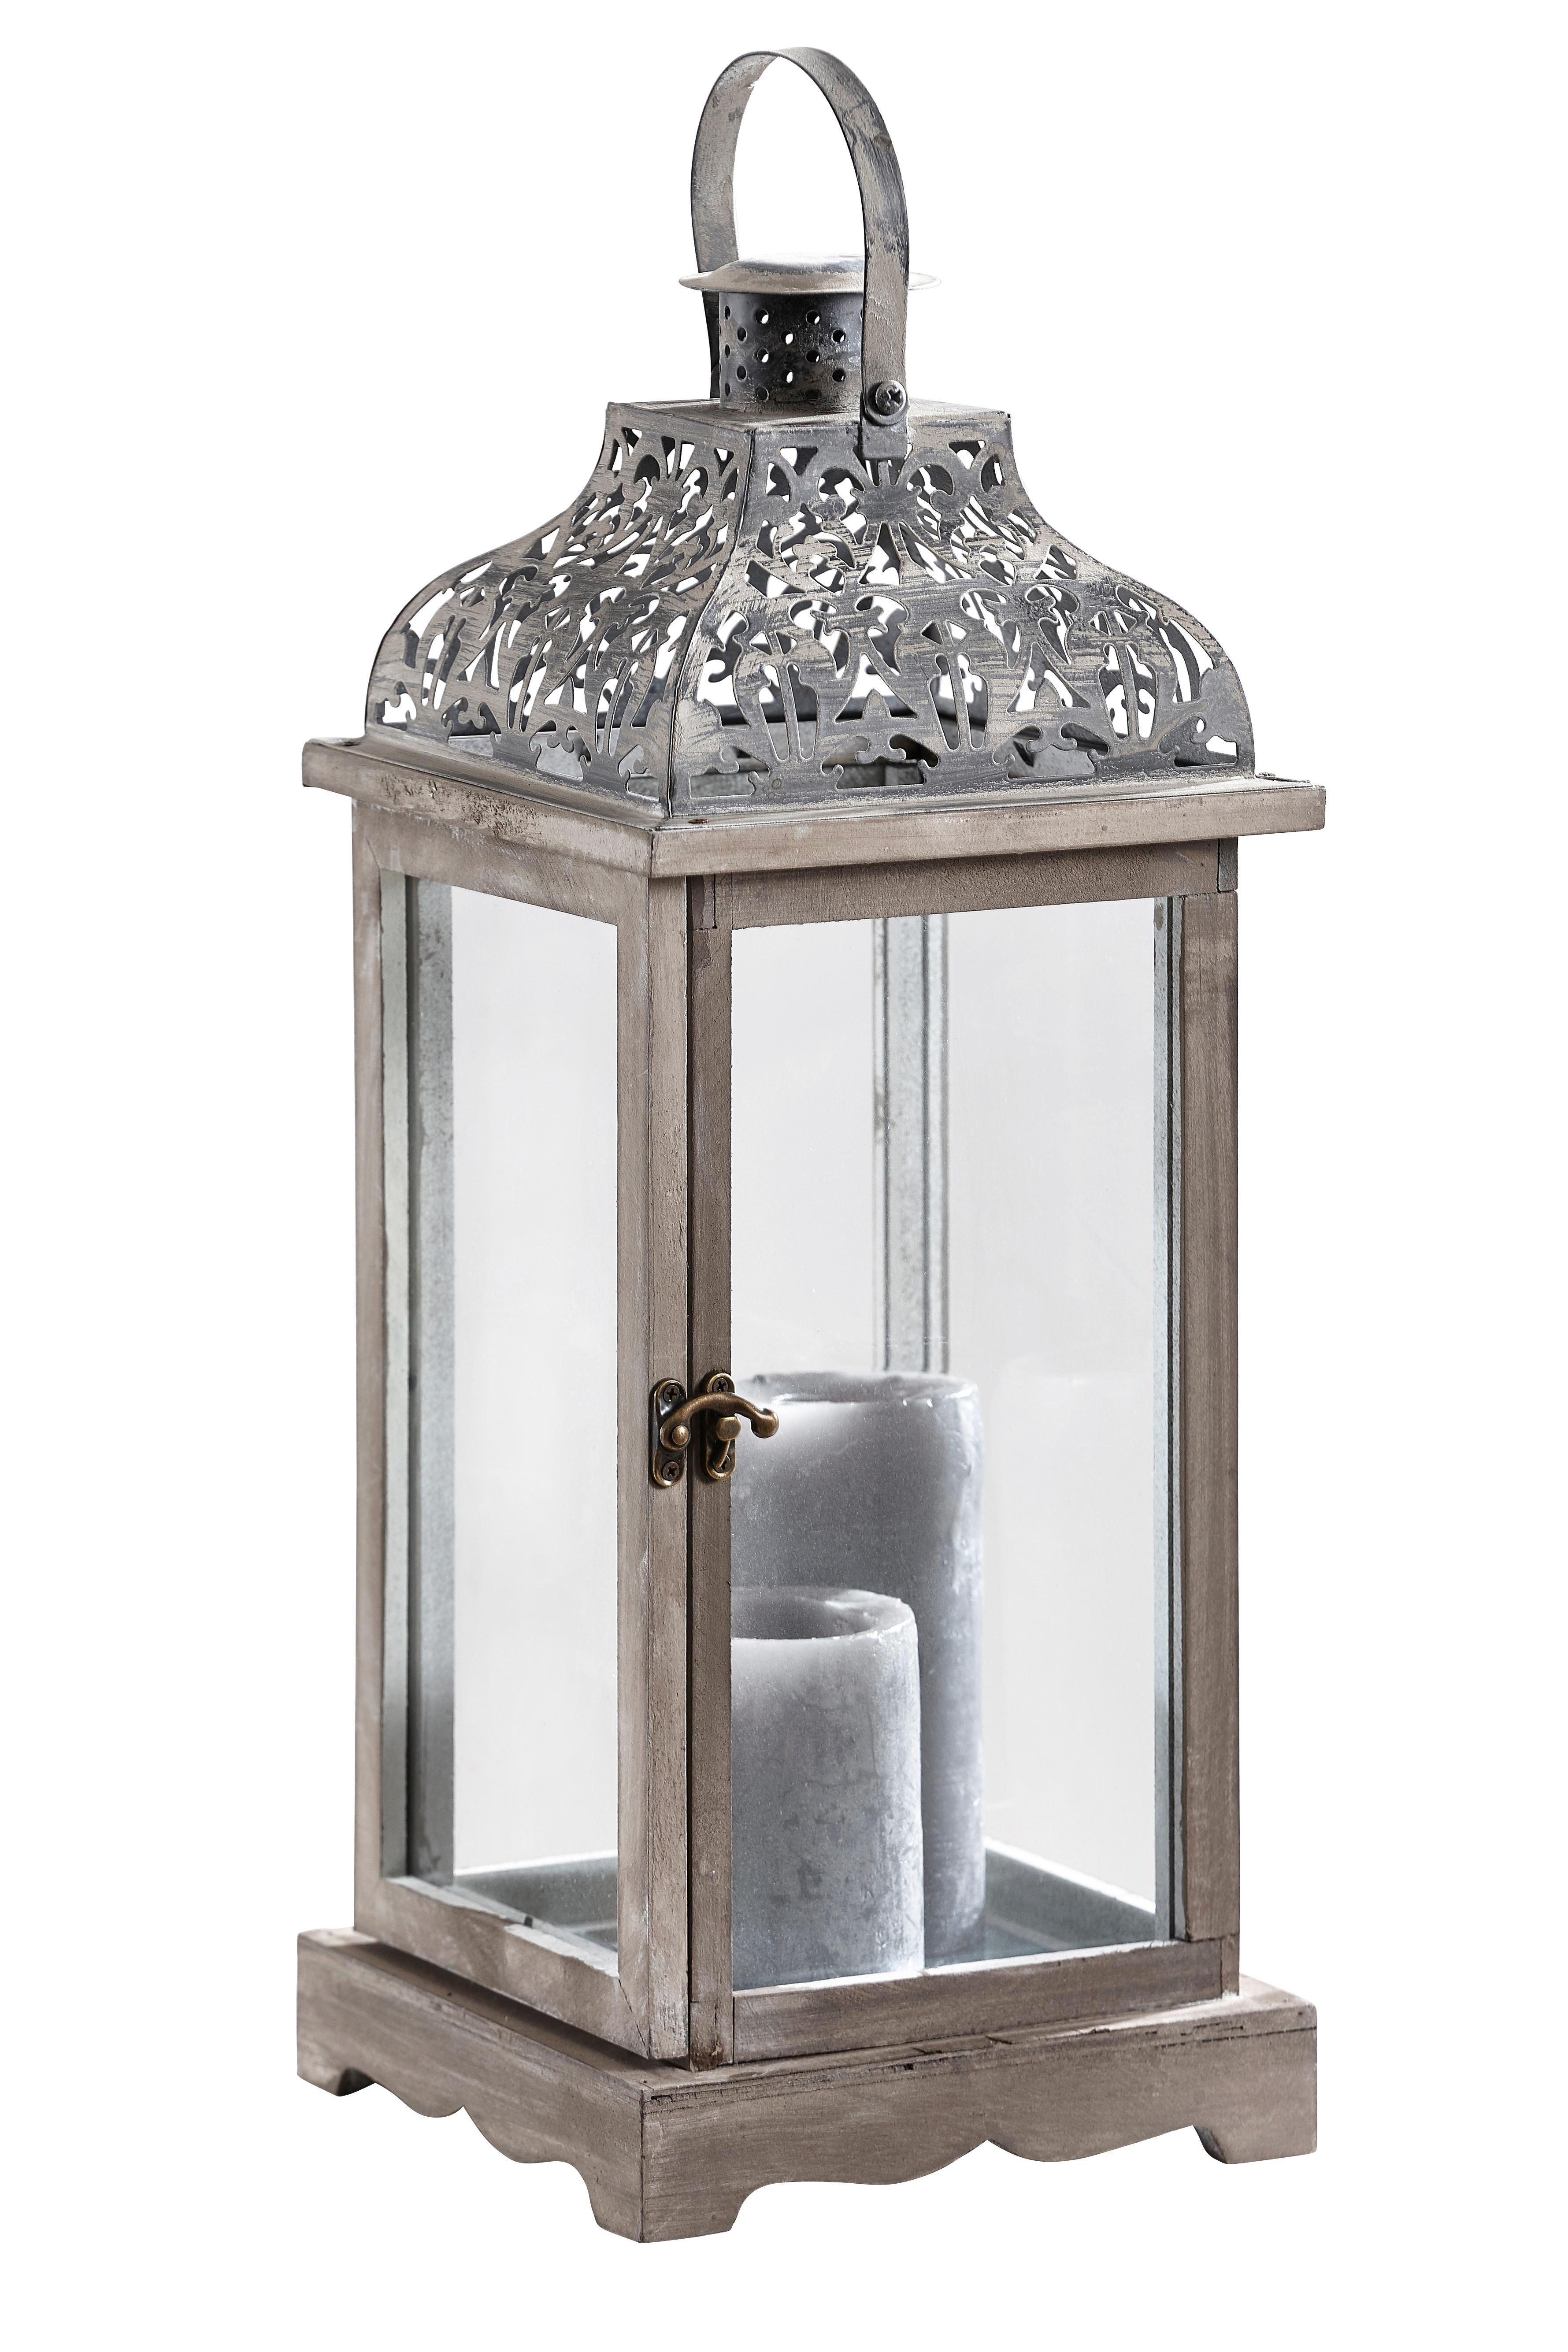 Windlichter Kerzenhalter Online Shoppen